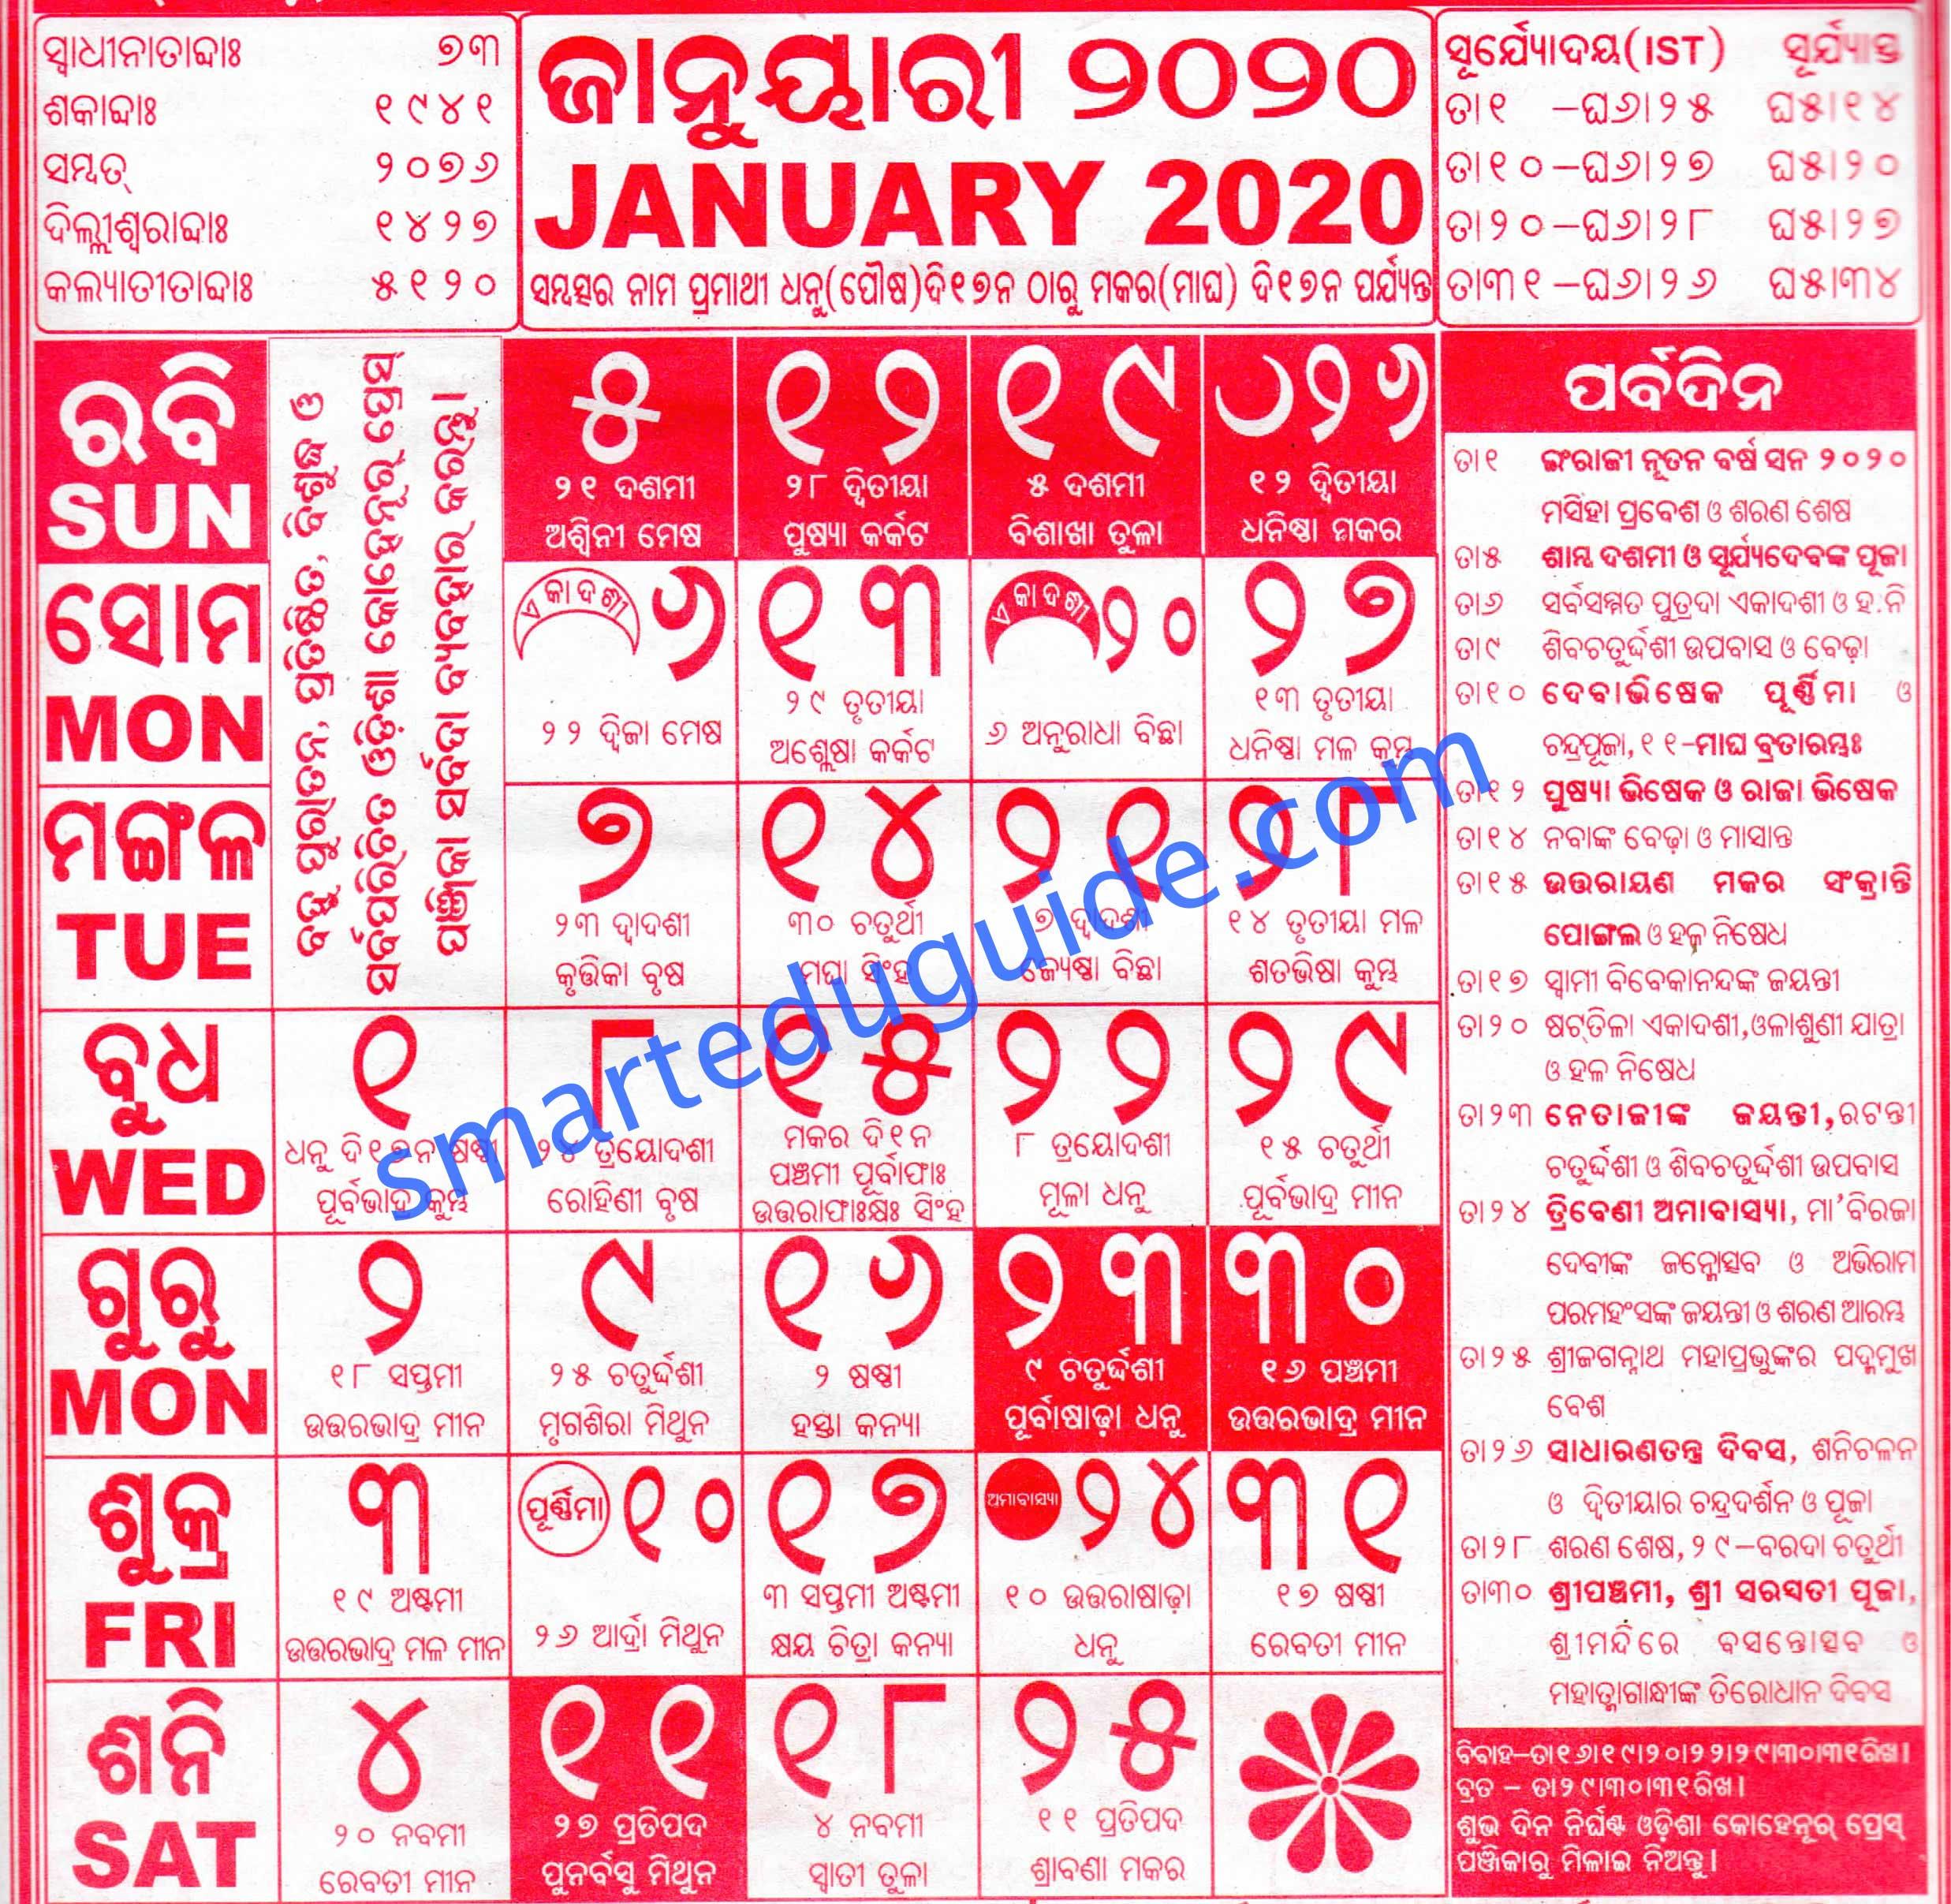 Odia Calendar 2020 Kohinoor Pdf | Seg for Bhagyadipa Odia Calendar 2020